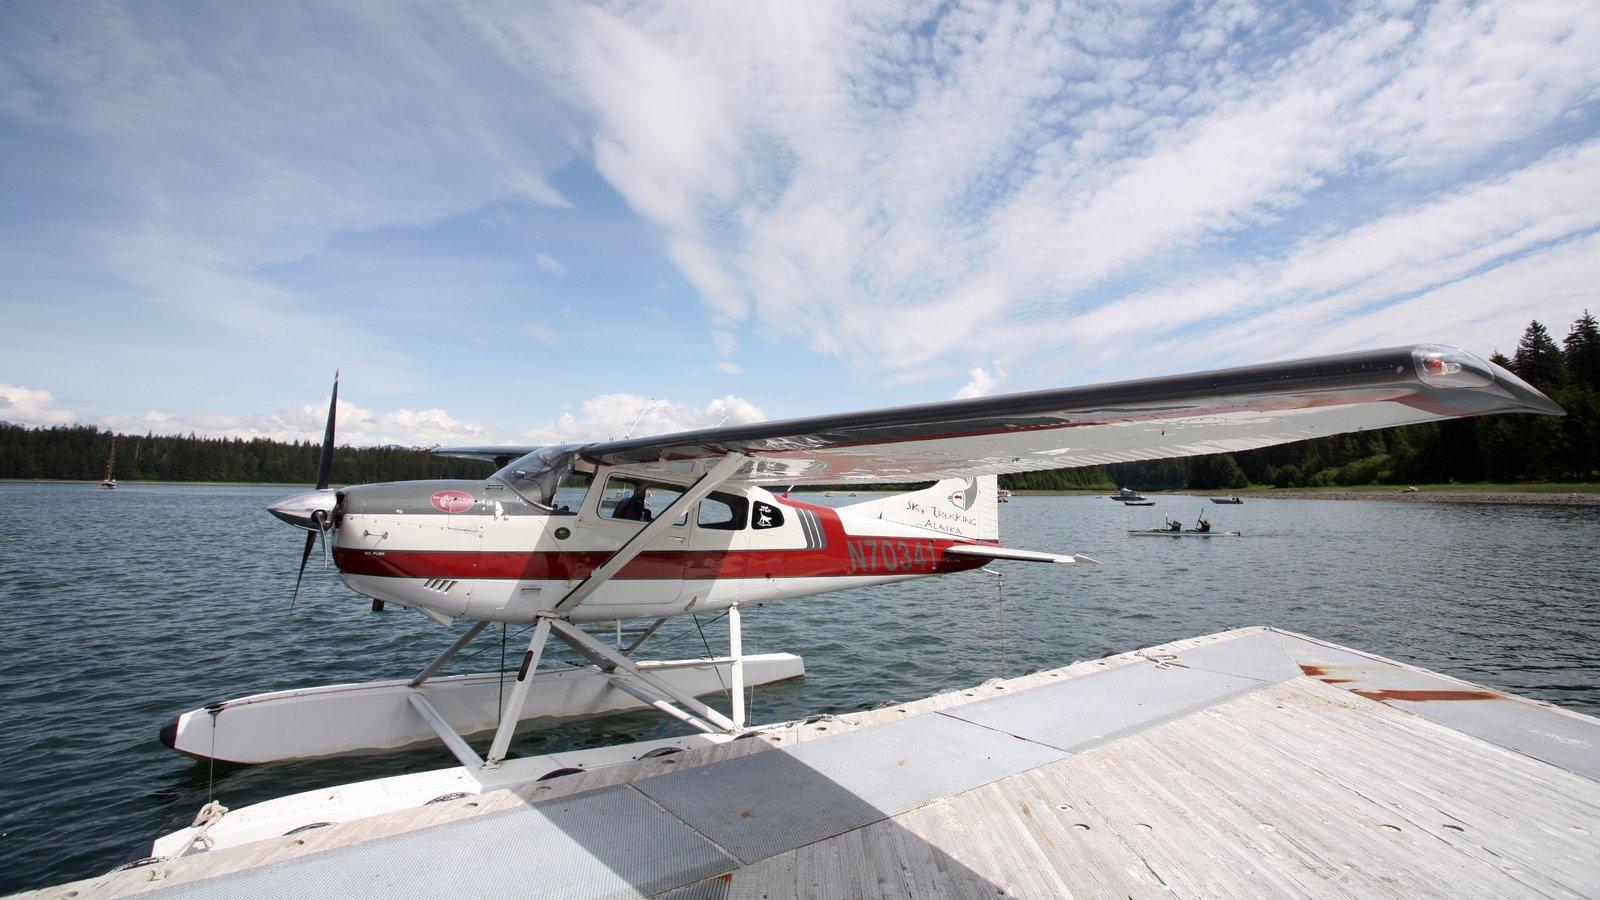 Glacier Bay National Park showing aircraft and a bay or harbor